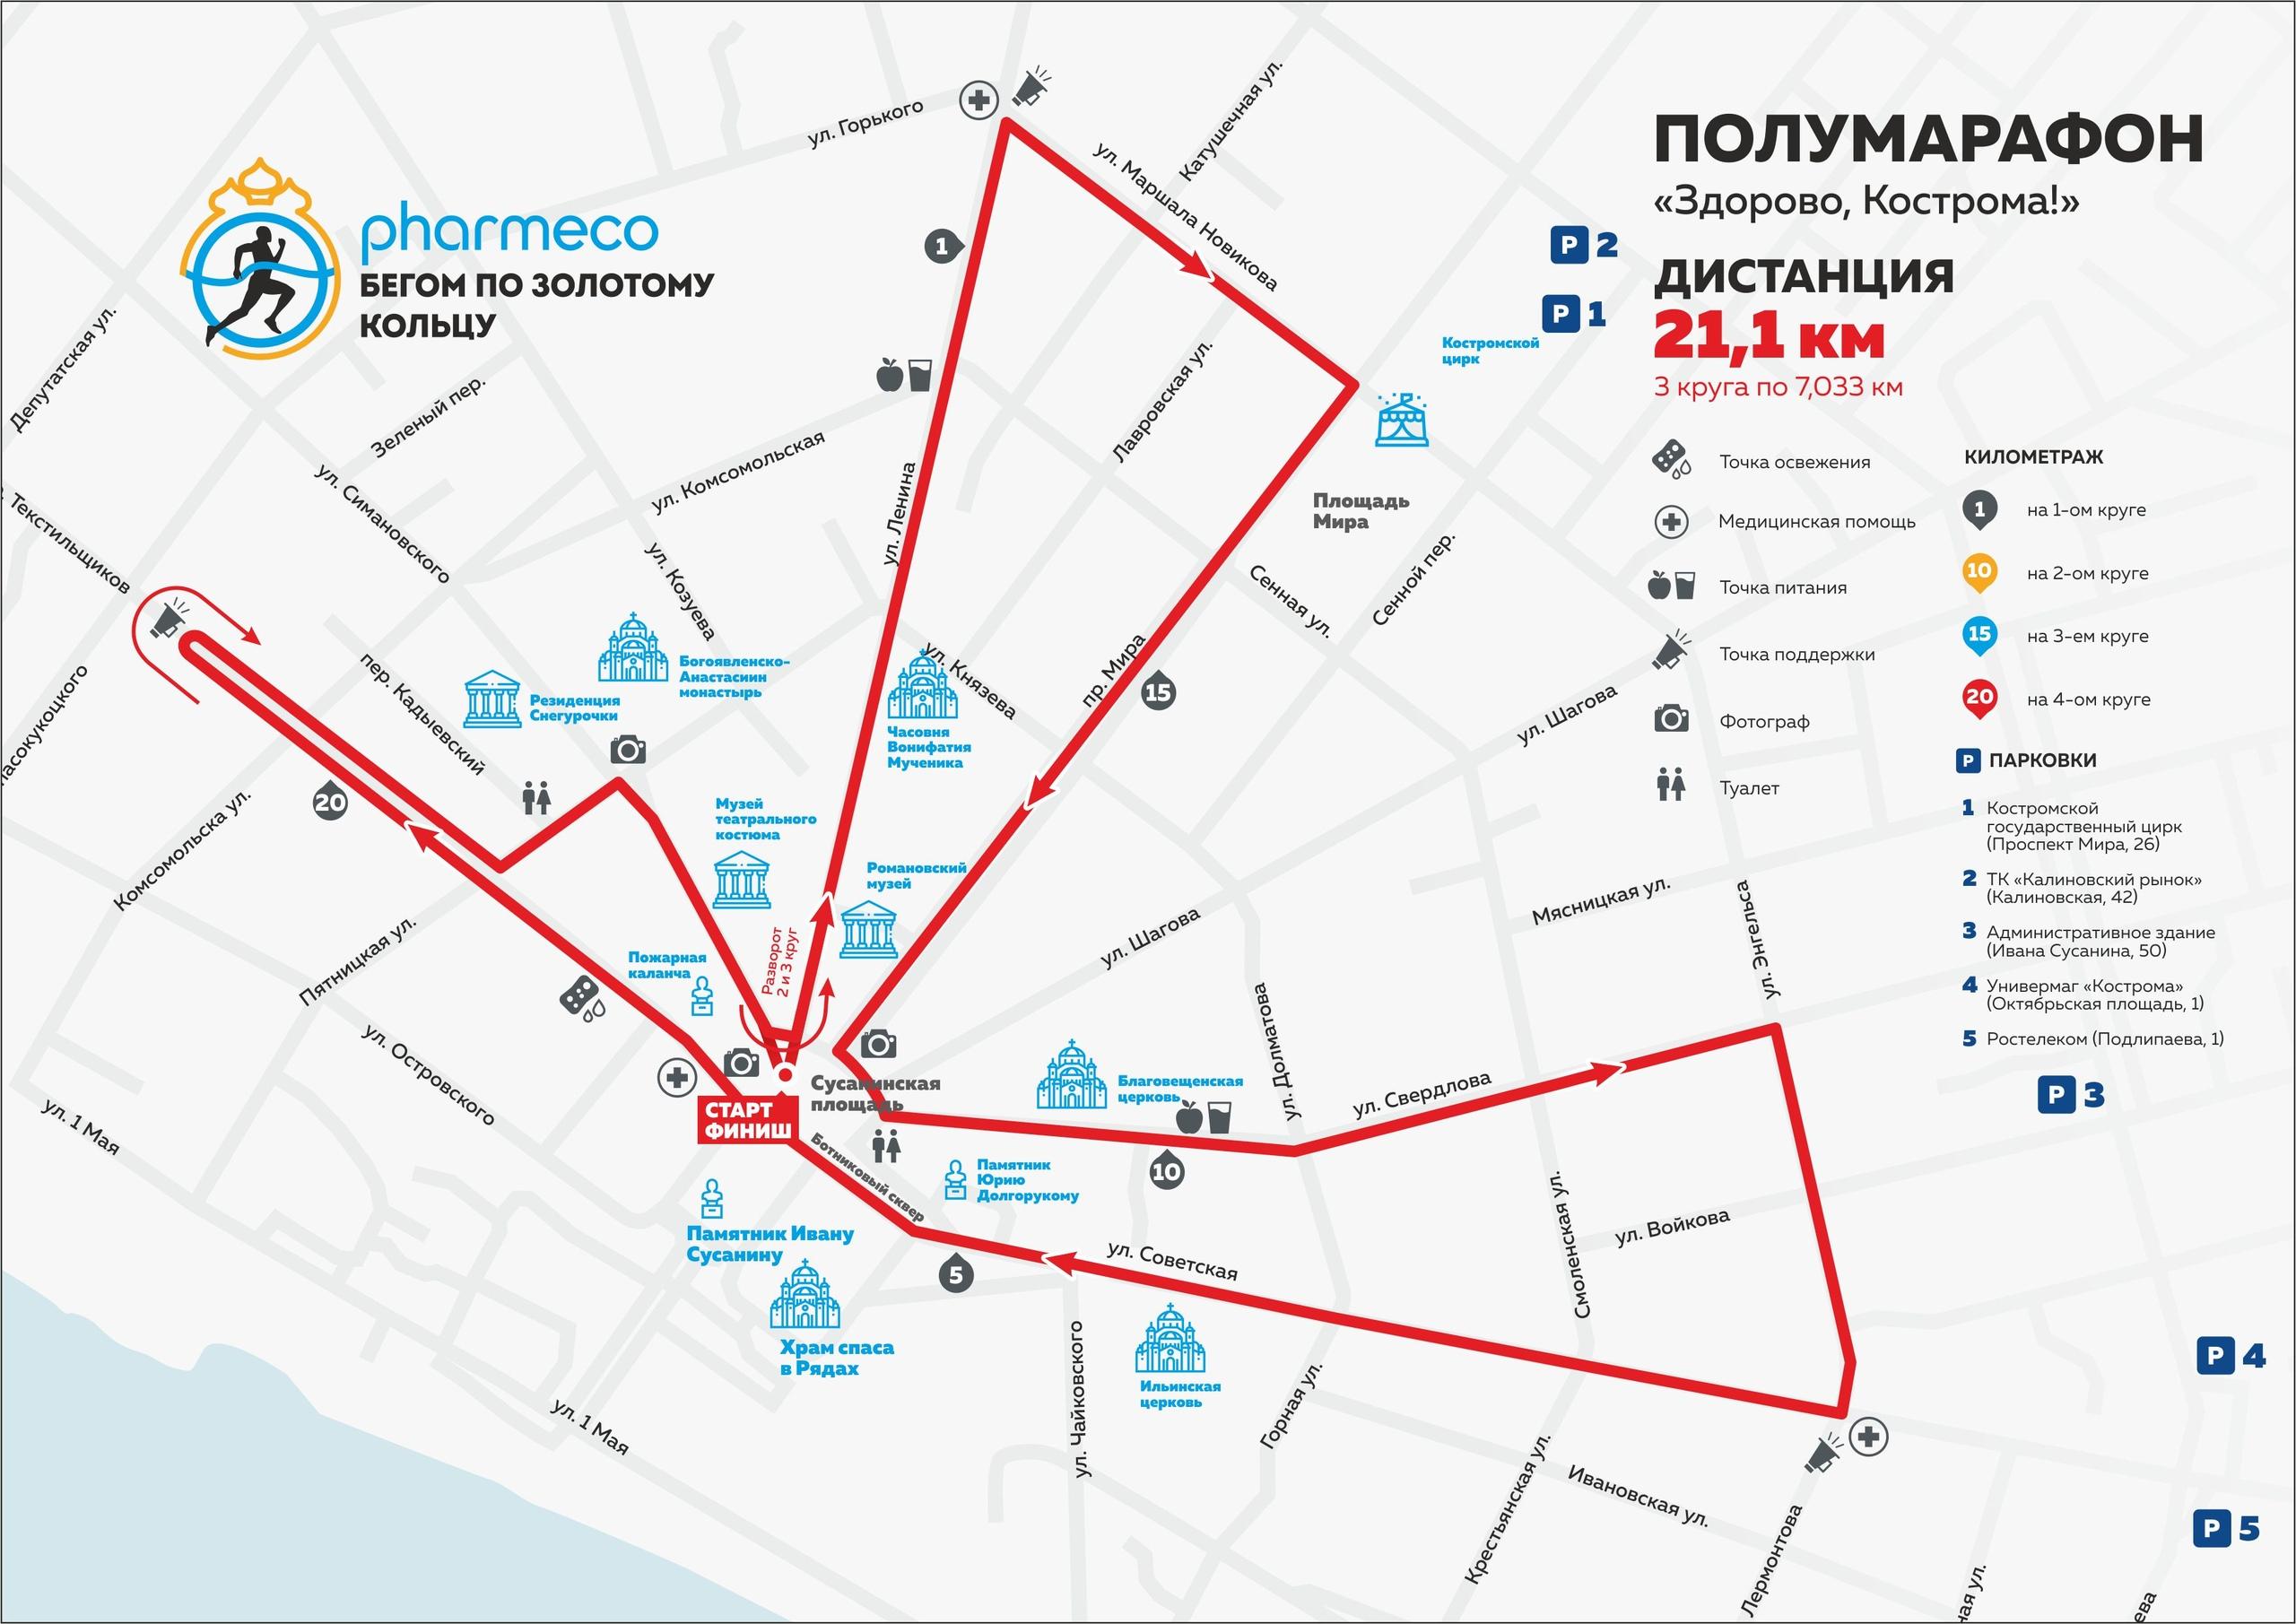 Карта дистанции 21,1 км Полумарафона Здорово, Кострома 2019